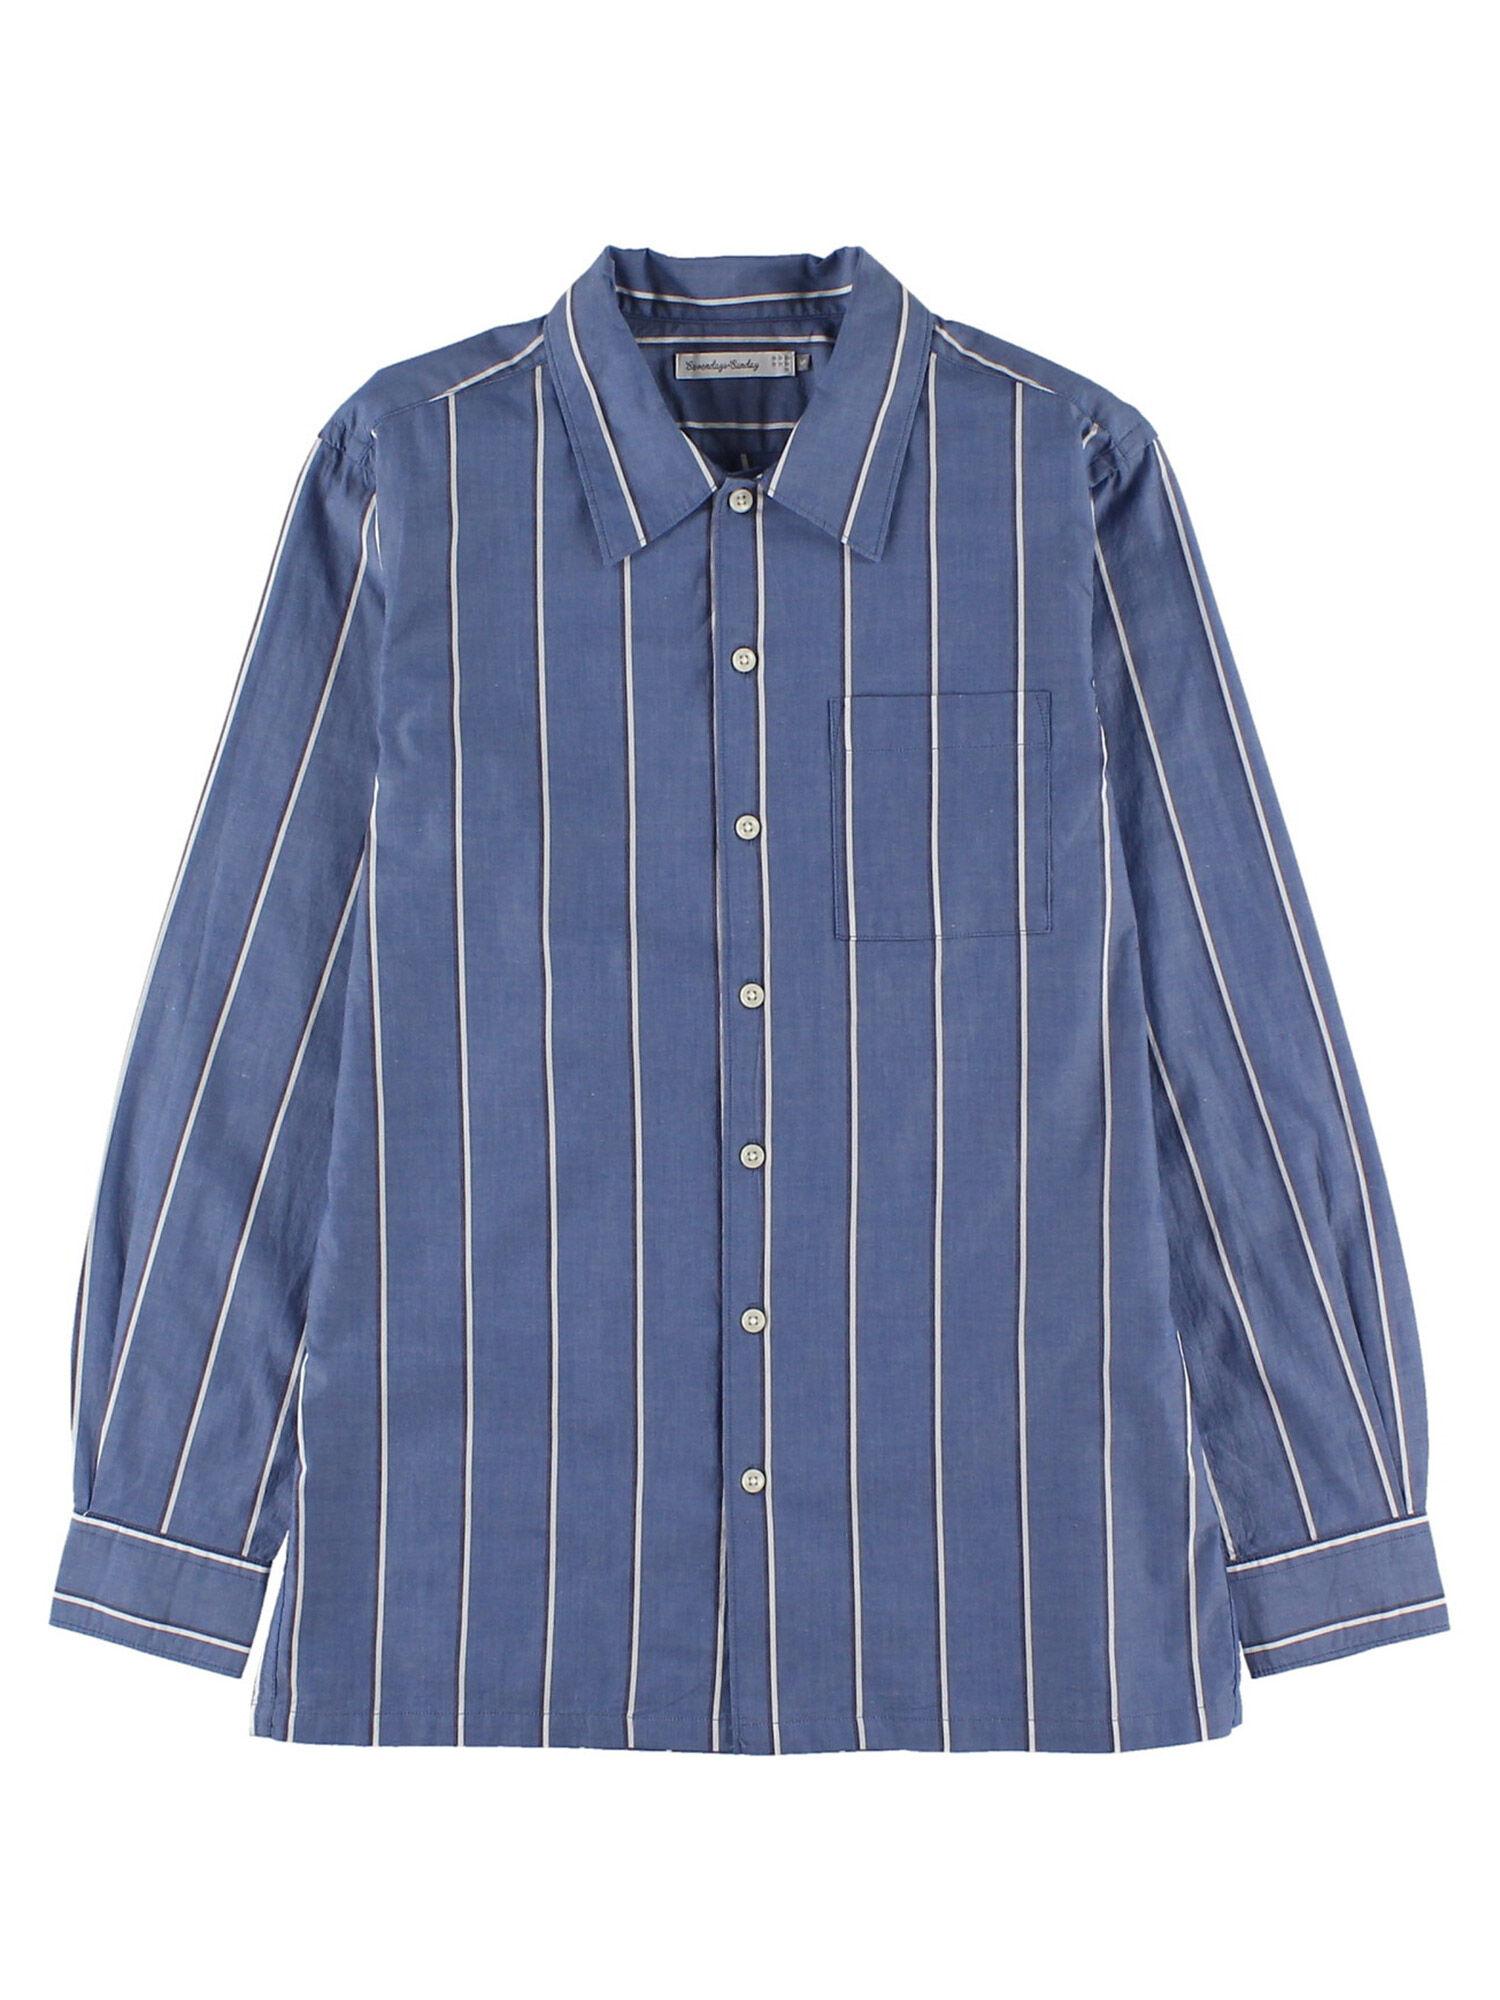 Men'sランダムストライプ長袖フレンチフロントシャツ